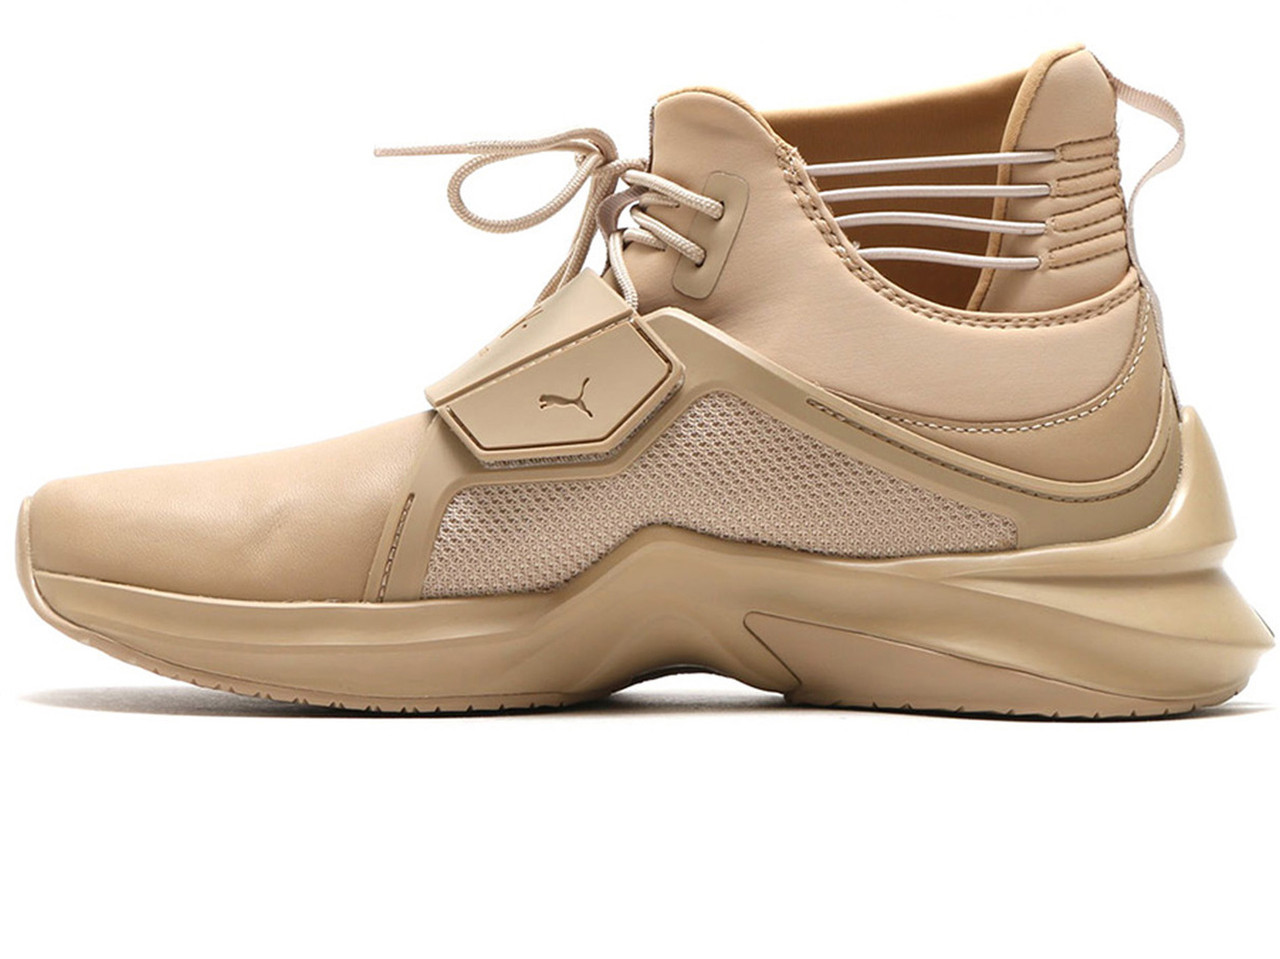 05aa6d91 Женские кроссовки PUMA Fenty Rihanna Trainer Beige (Реплика ААА+) - Rocket  Shoes -